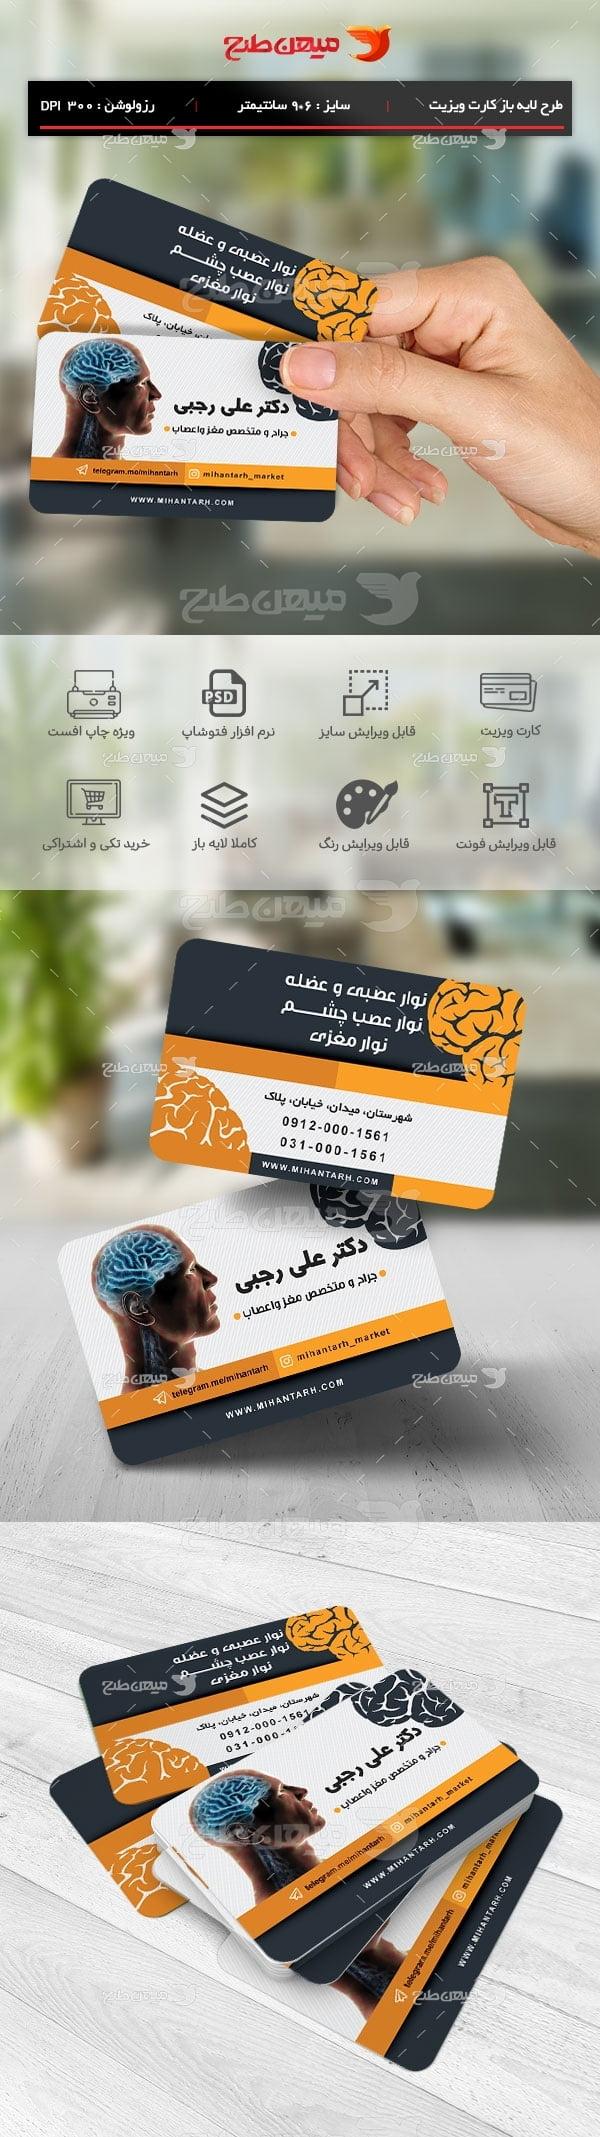 طرح لایه باز کارت ویزیت متخصص مغز و اعصاب